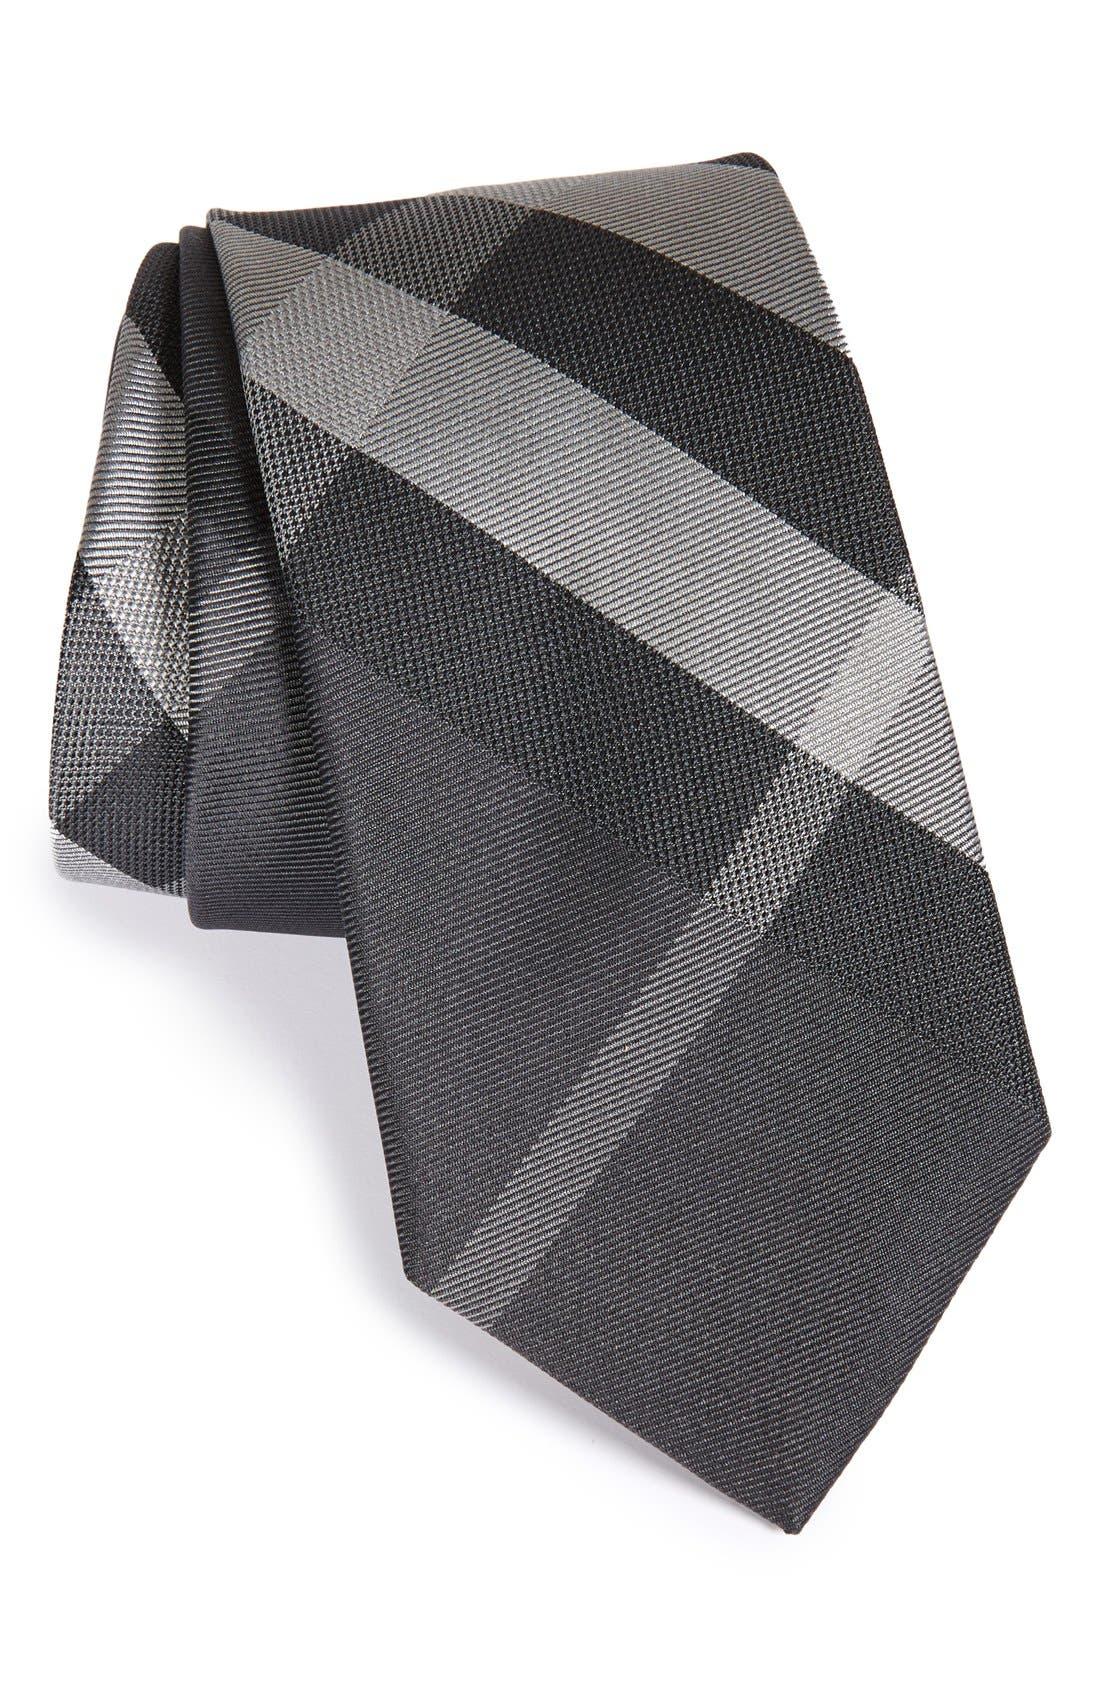 Alternate Image 1 Selected - Burberry Manston Check Silk Tie